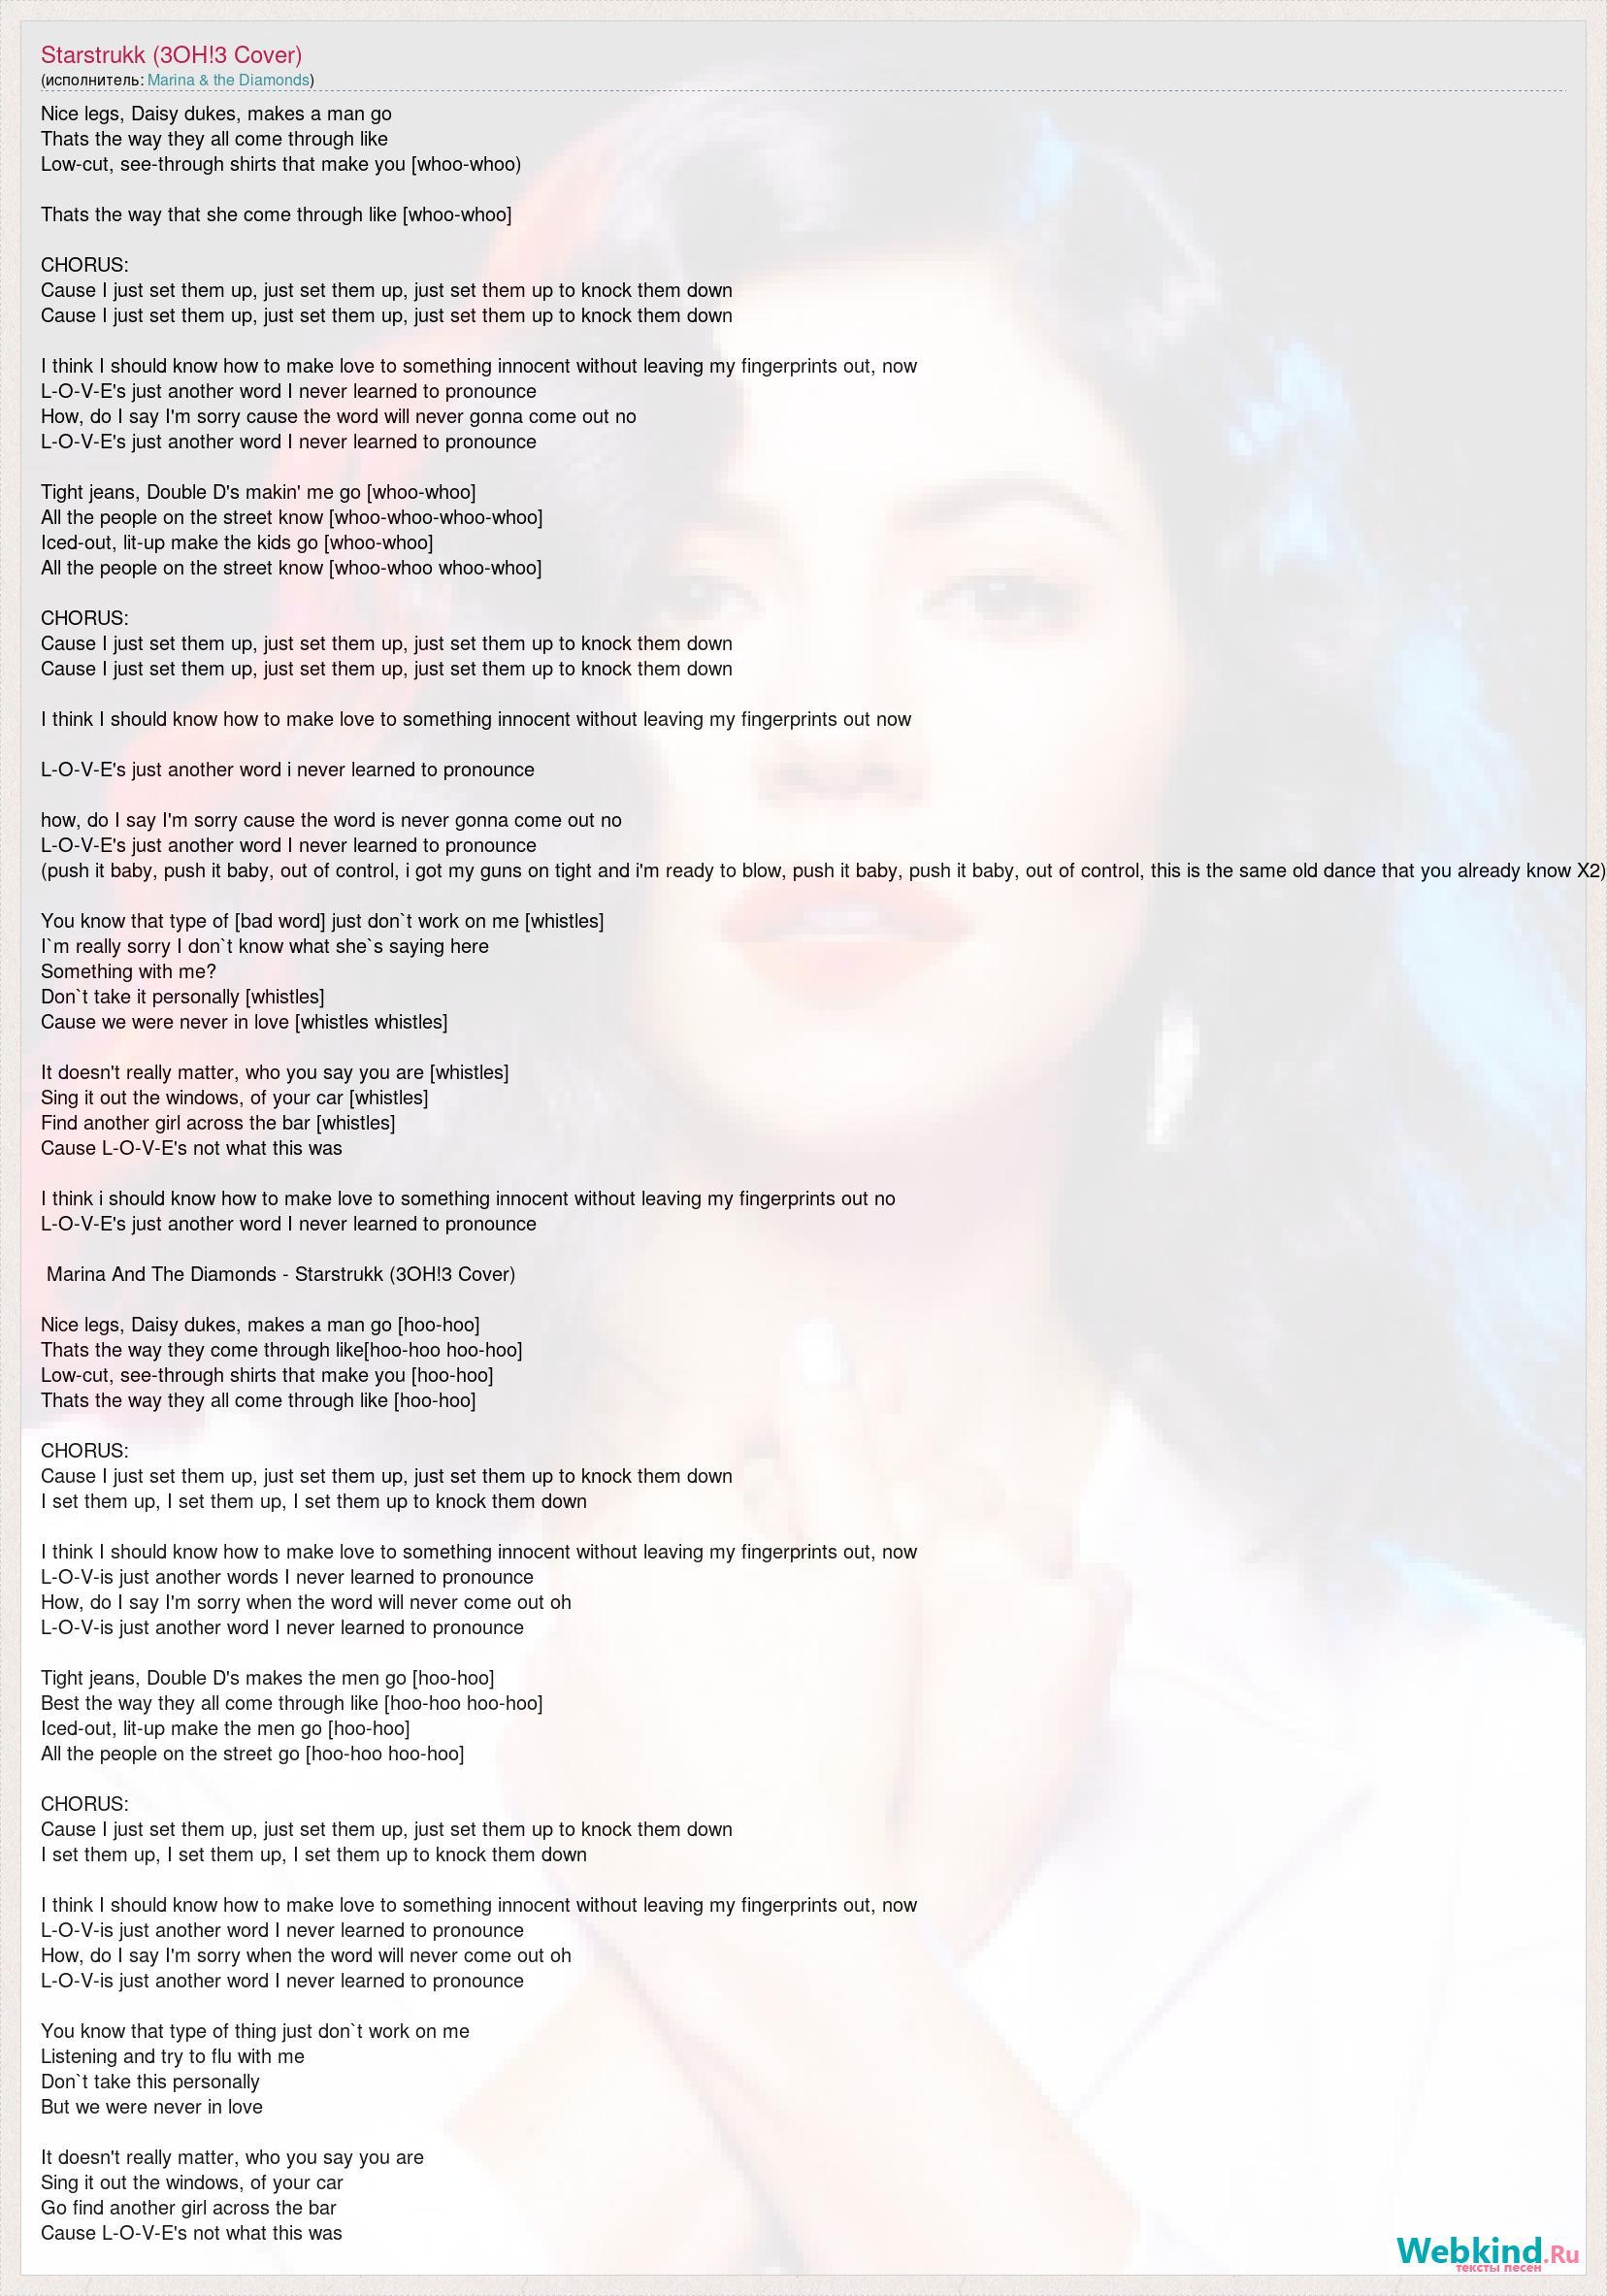 advanced lyrics search